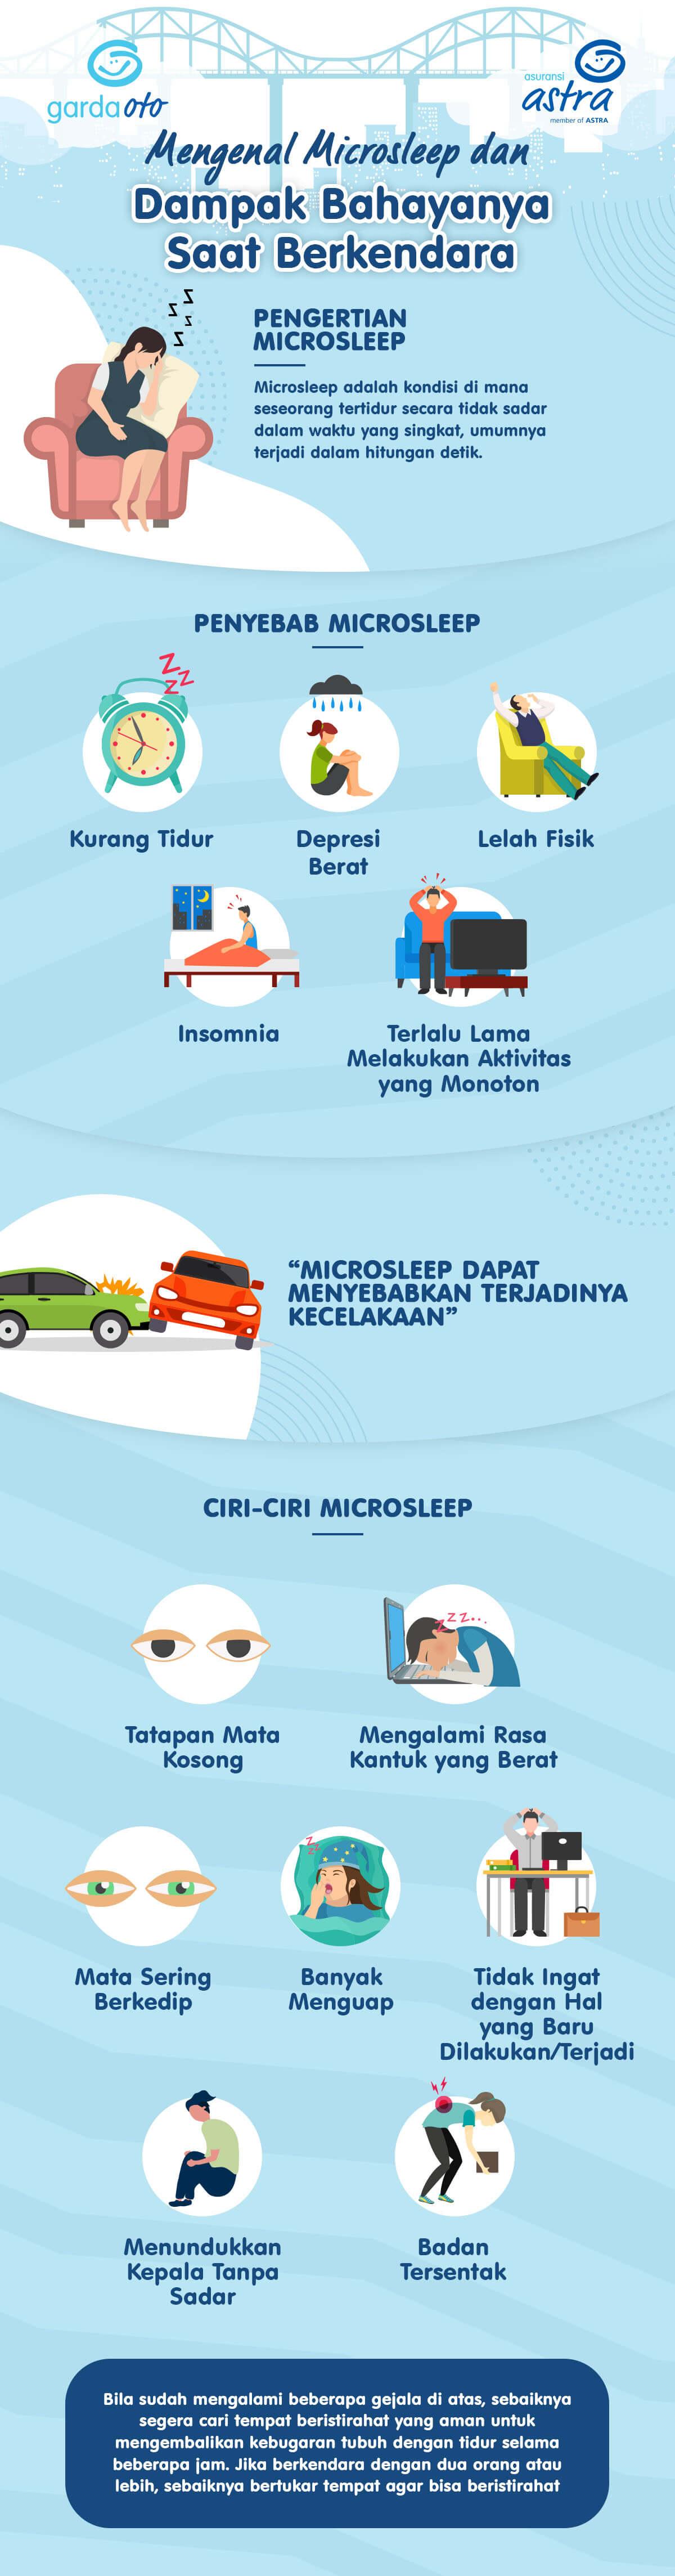 Infografis Bahaya Microsleep saat berkendara